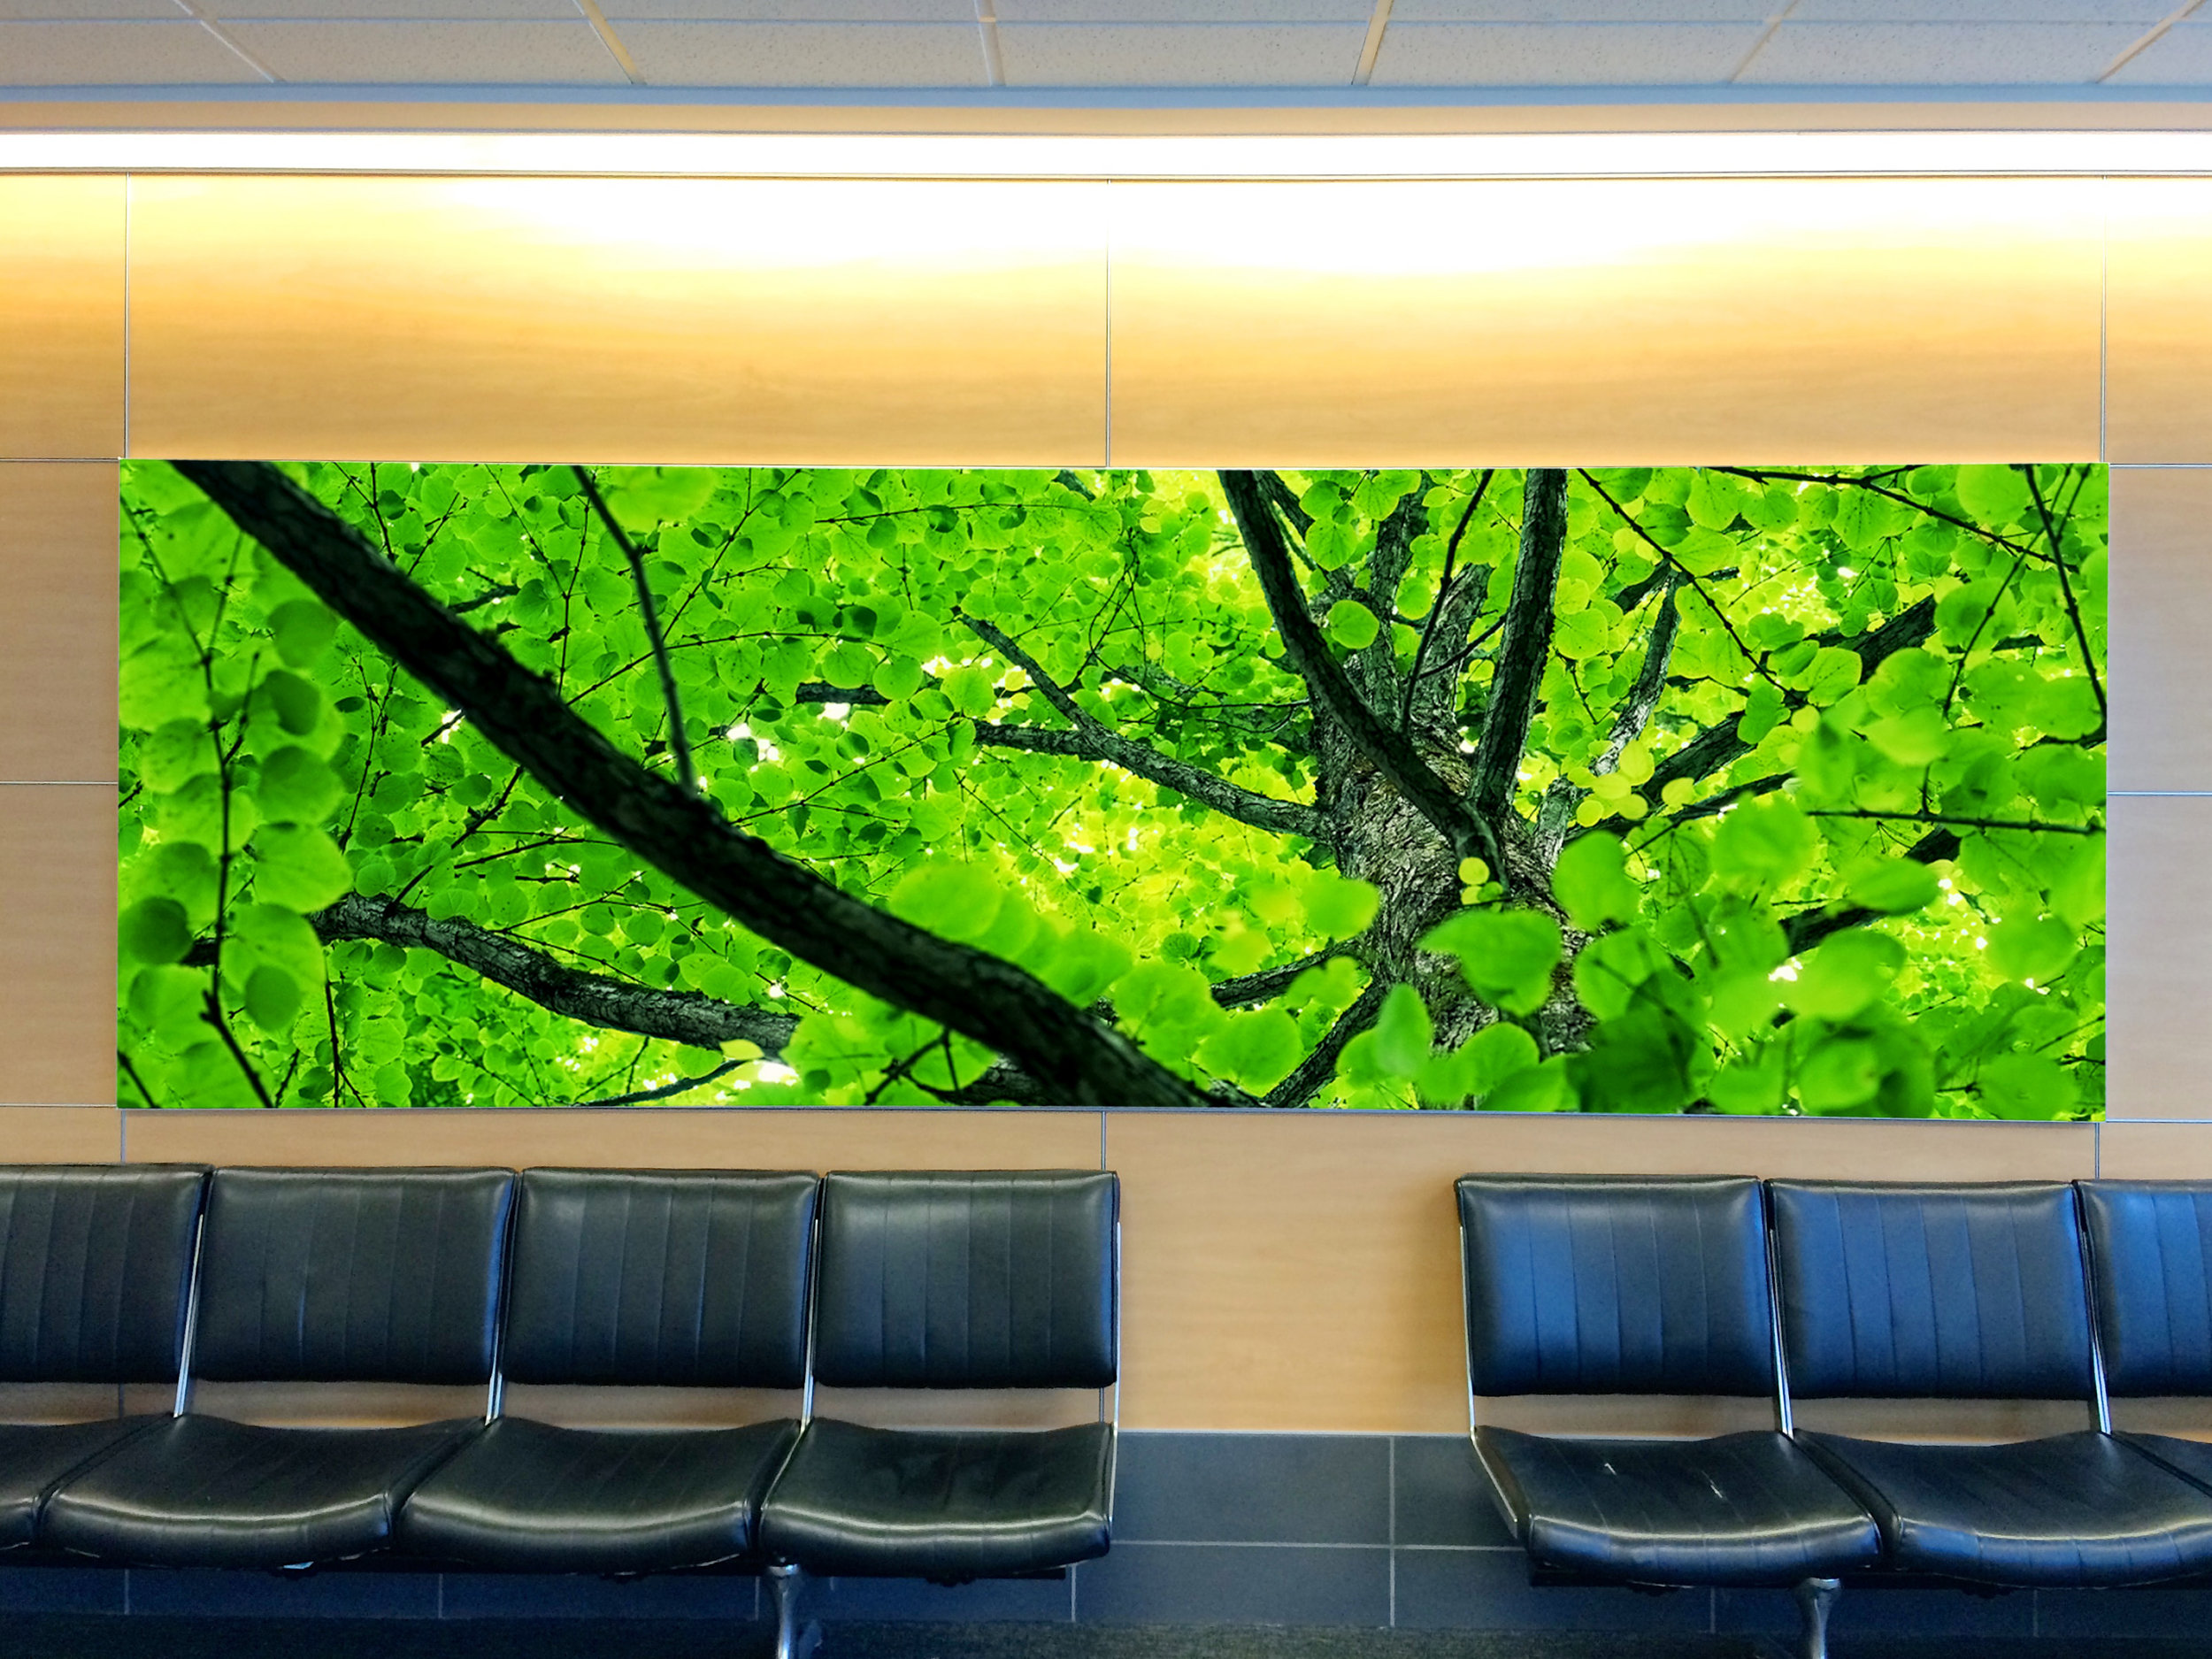 B Concourse Tension Fabric Display at Gate B1.jpg